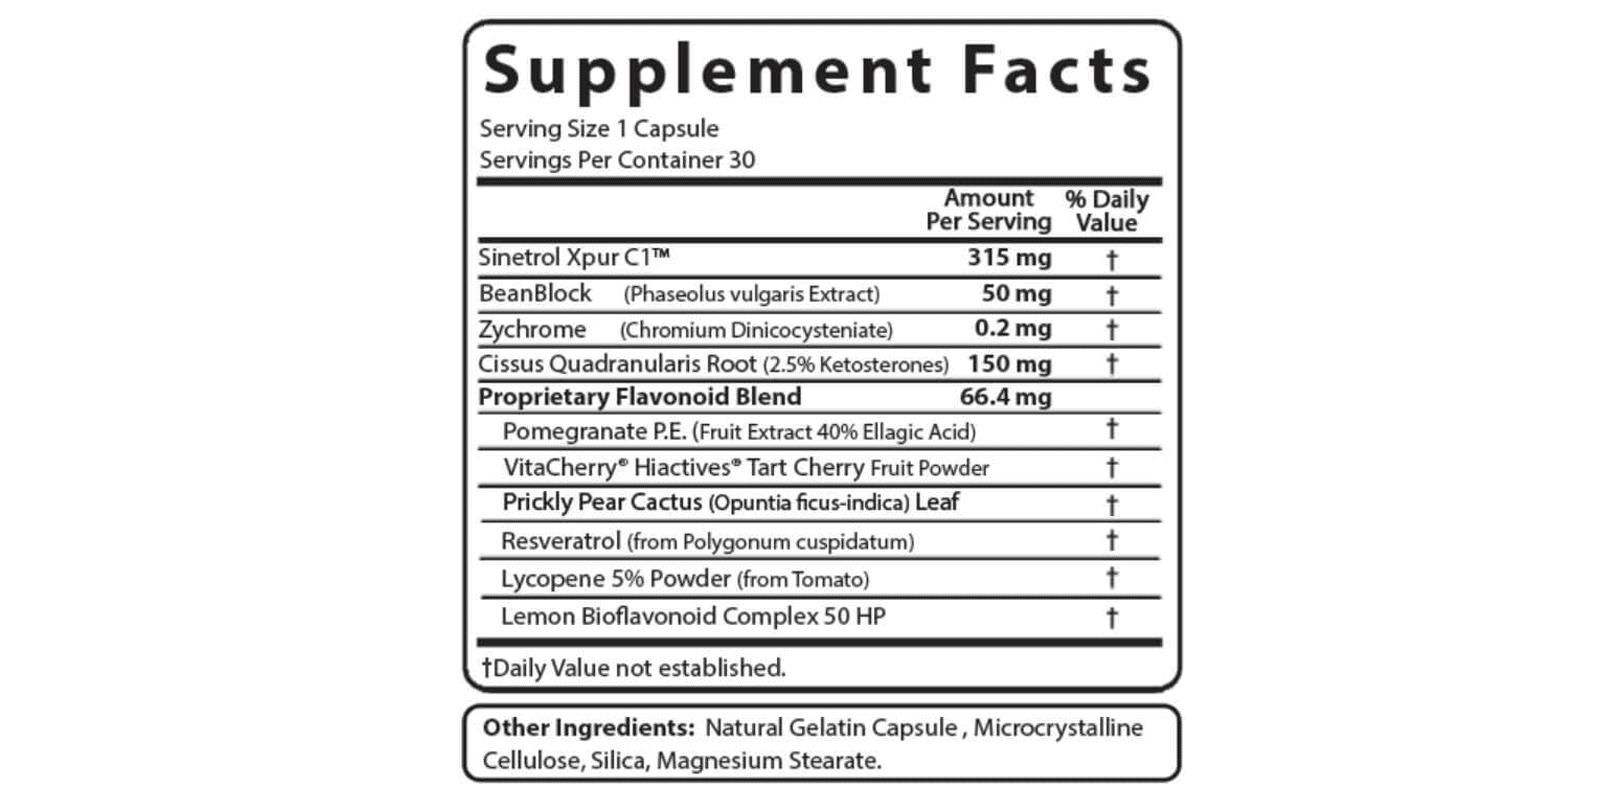 Flavo Trim dosage